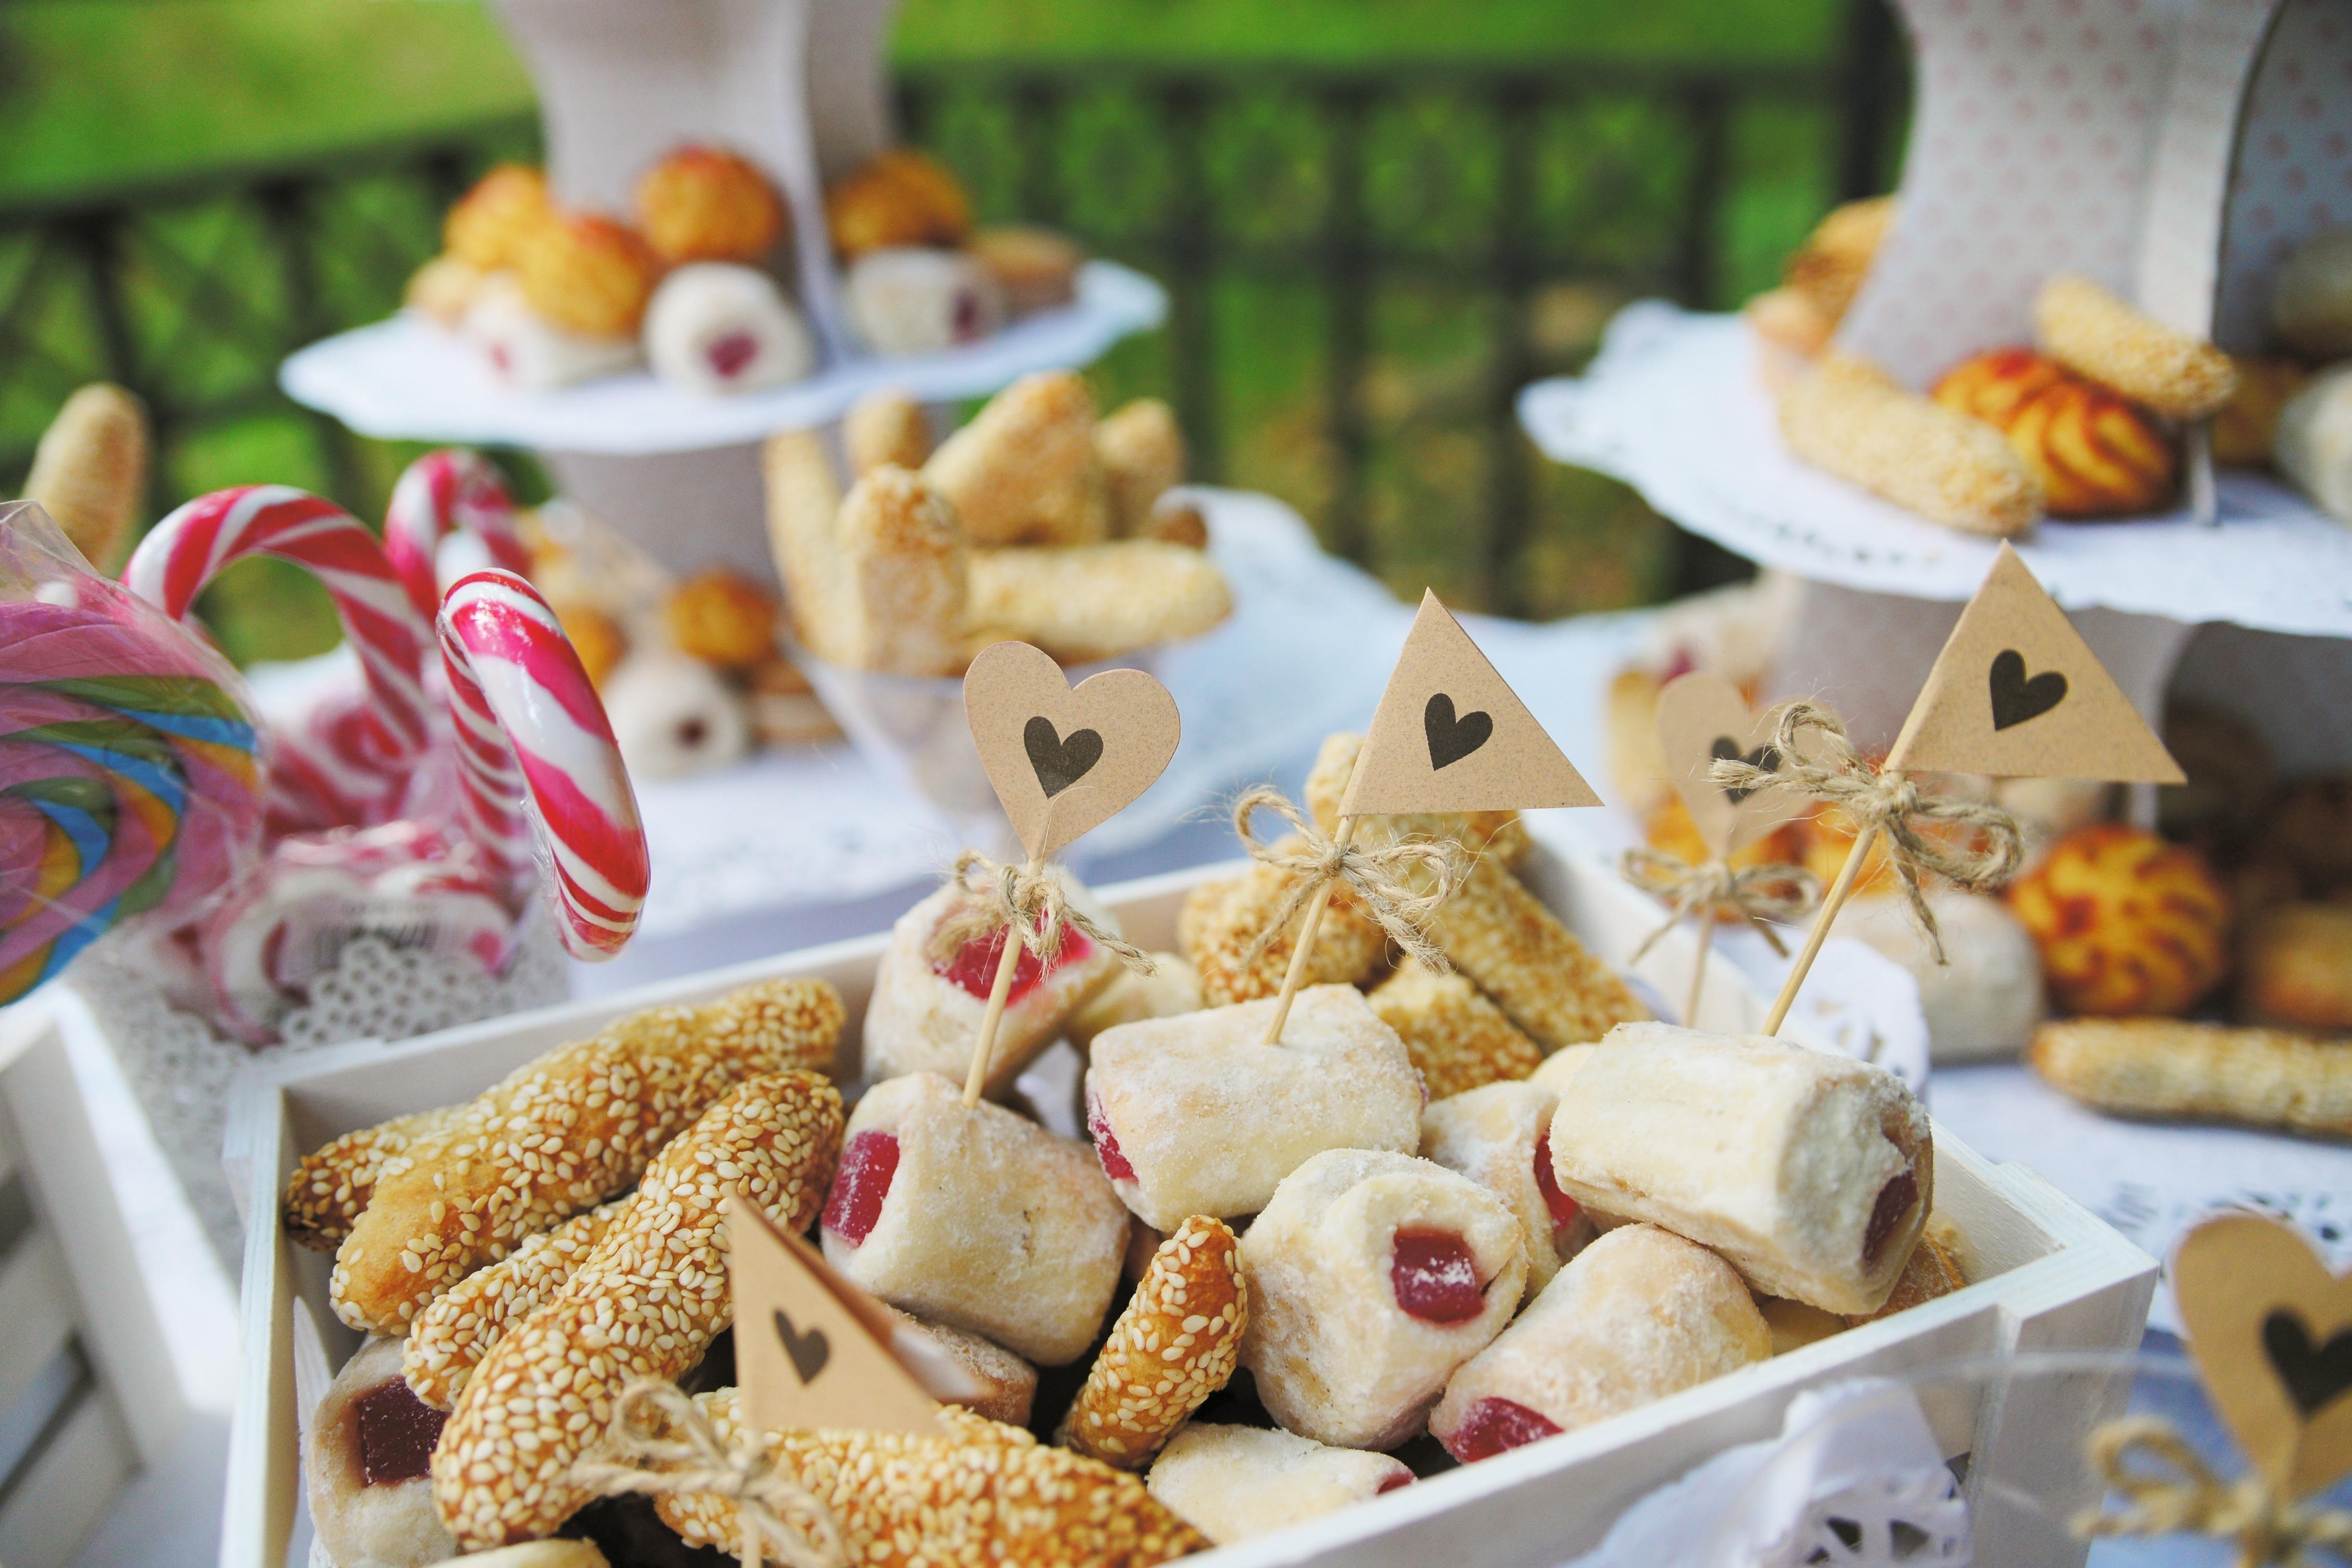 Fotos gratis celebracion plato comida produce - Platos para picnic ...